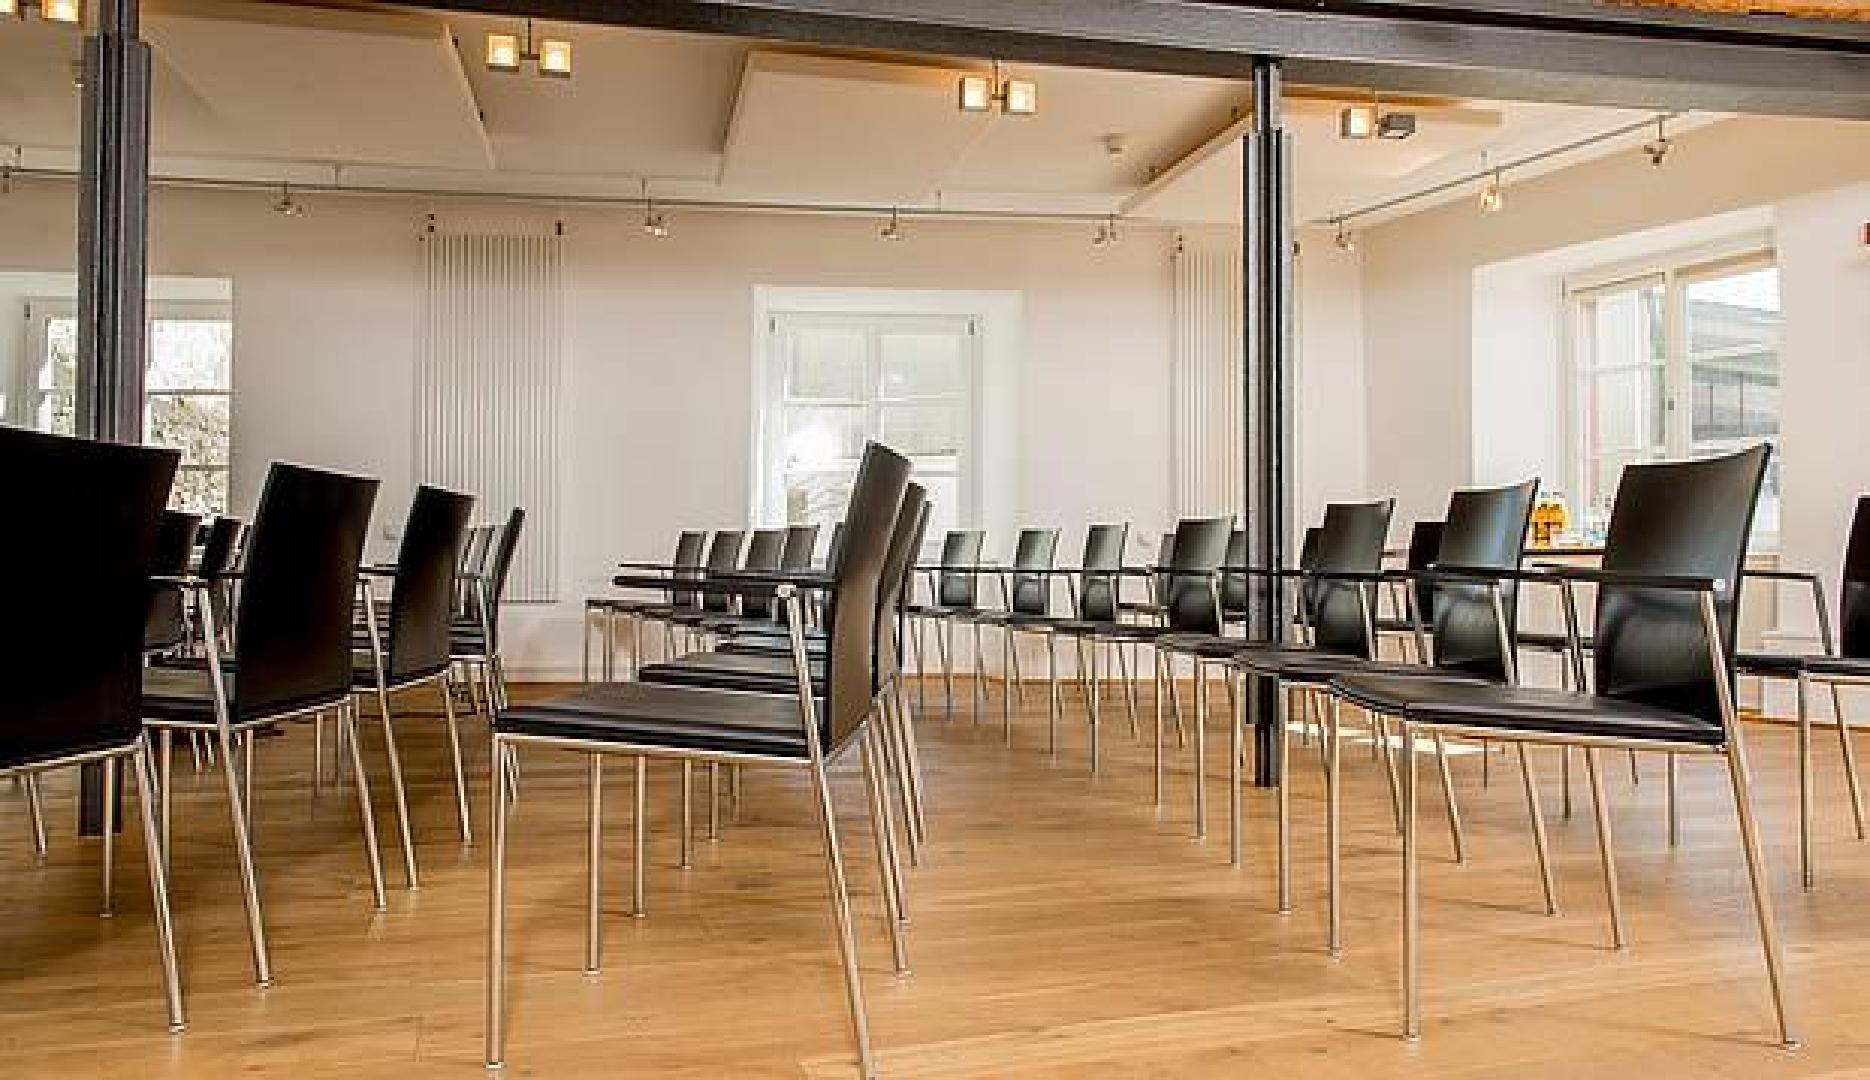 Abt Gaisser Saal Konferenzraum Eventlocation Eventlocation In Villingen Schwenningen